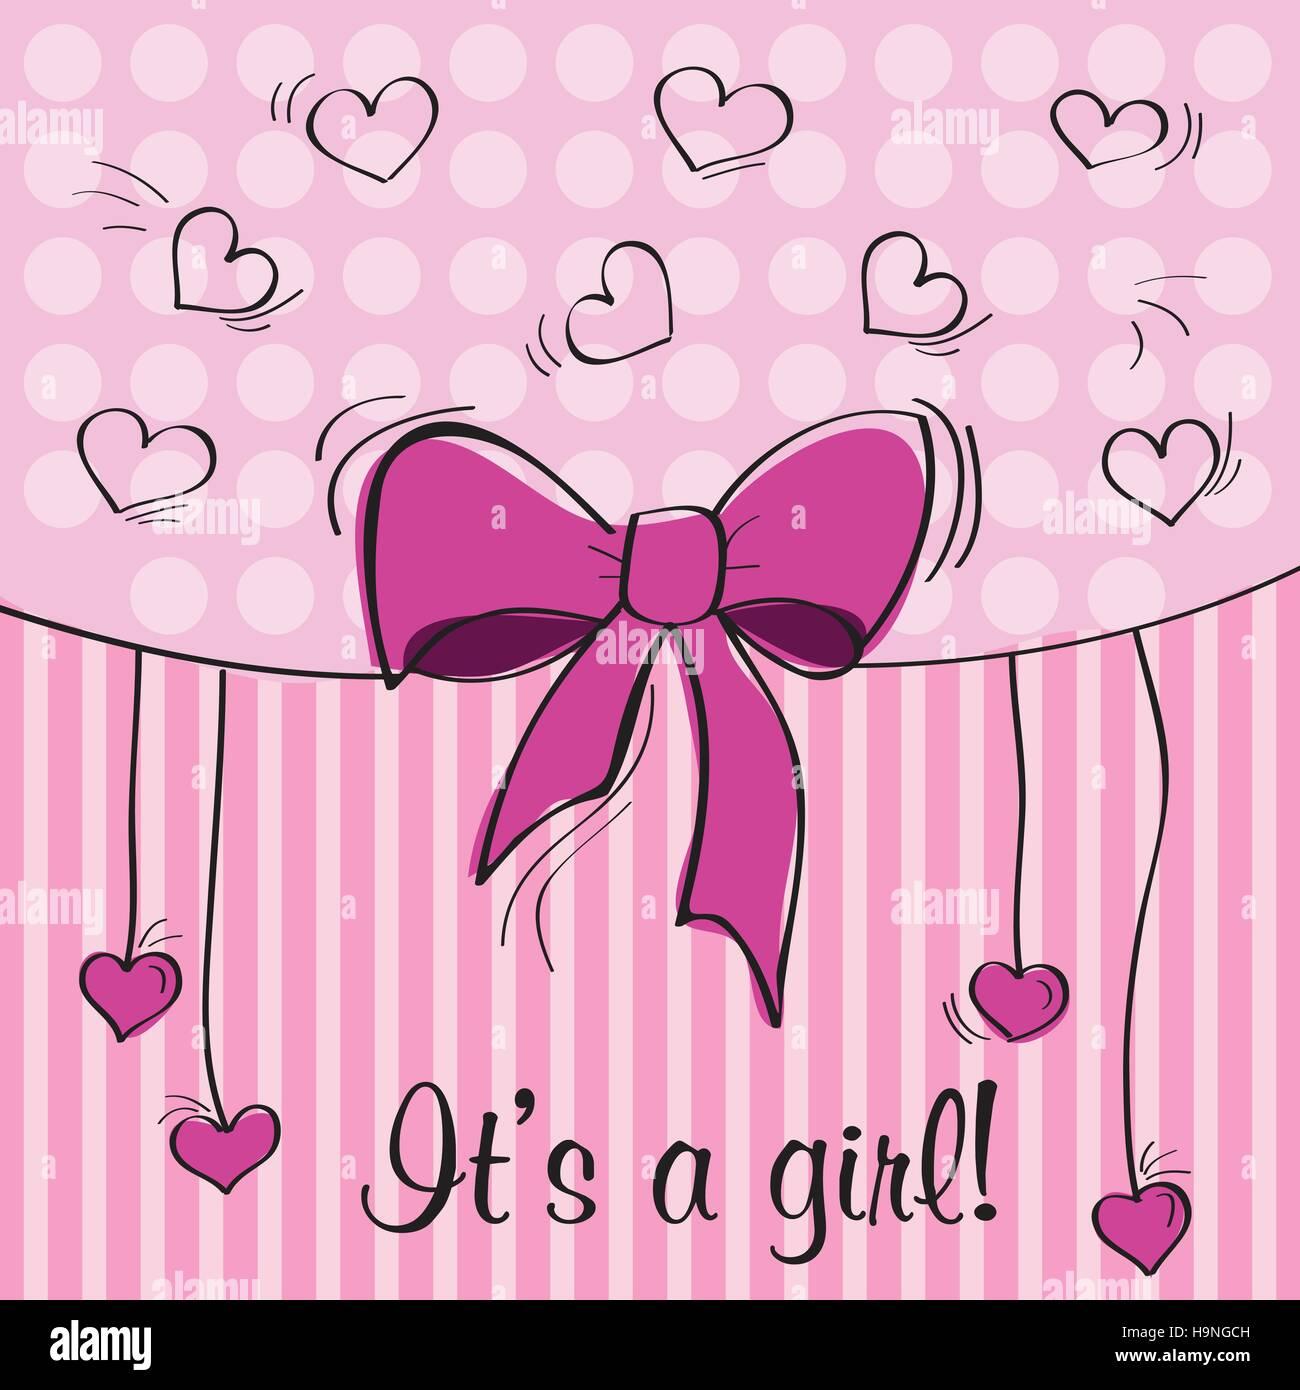 Baby girl shower card  - pink design - vector illustration - Stock Image